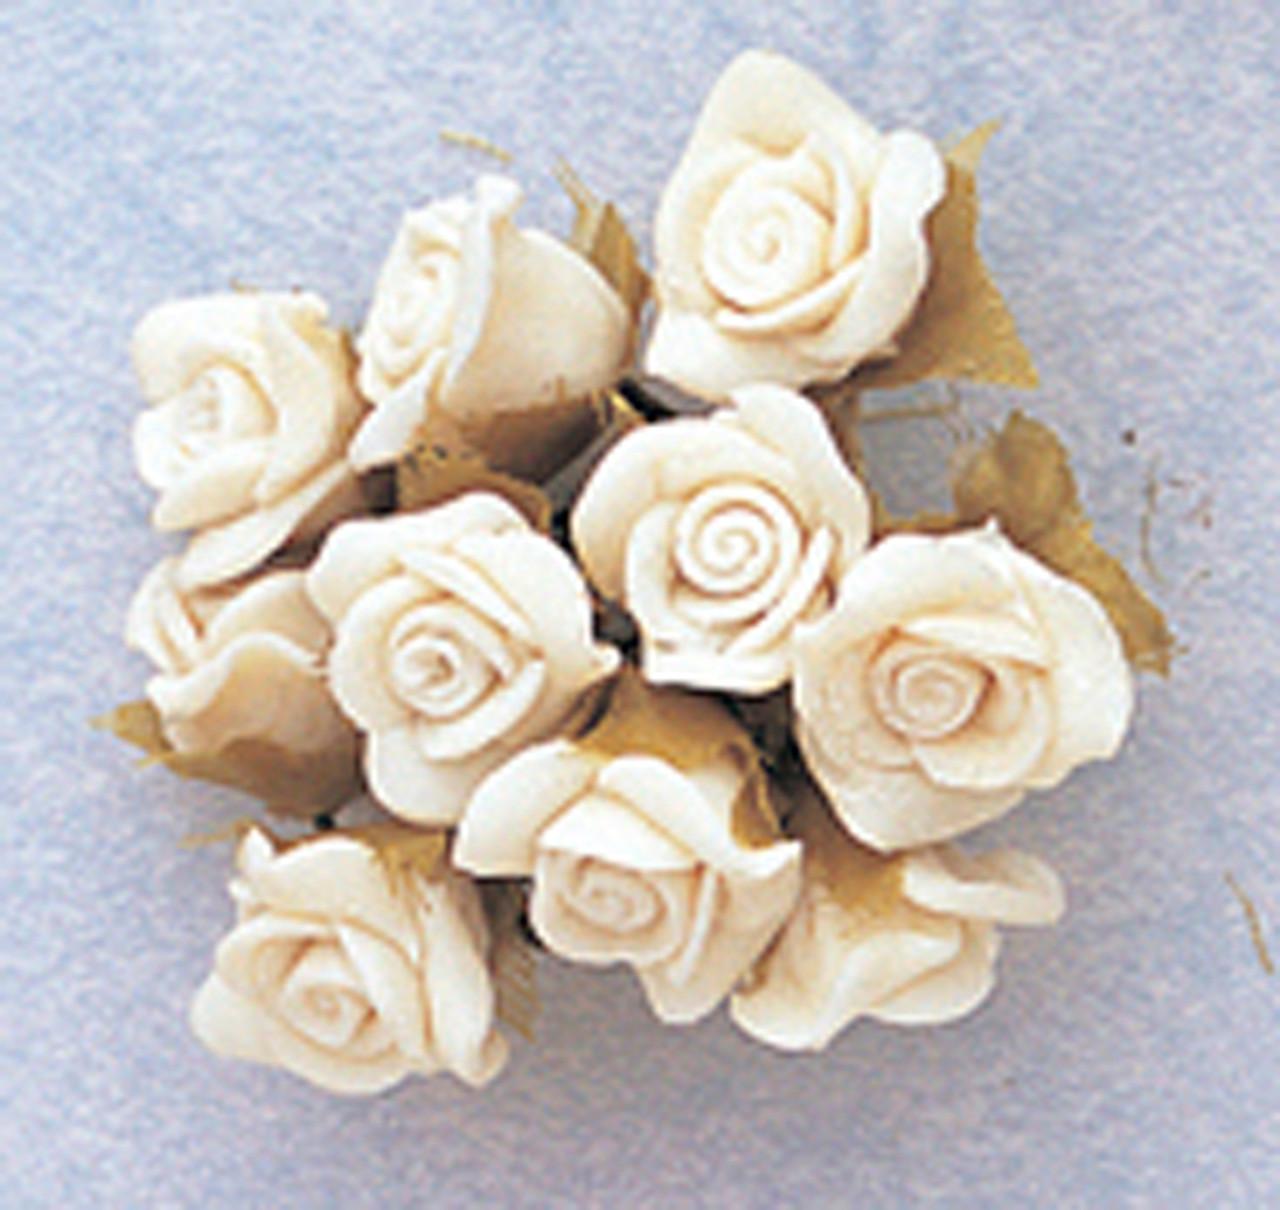 stem flower flower supply flower with wire handmade flower porcelain flower clay flower 5 SPRING FLOWER pastel flower cold porcelain